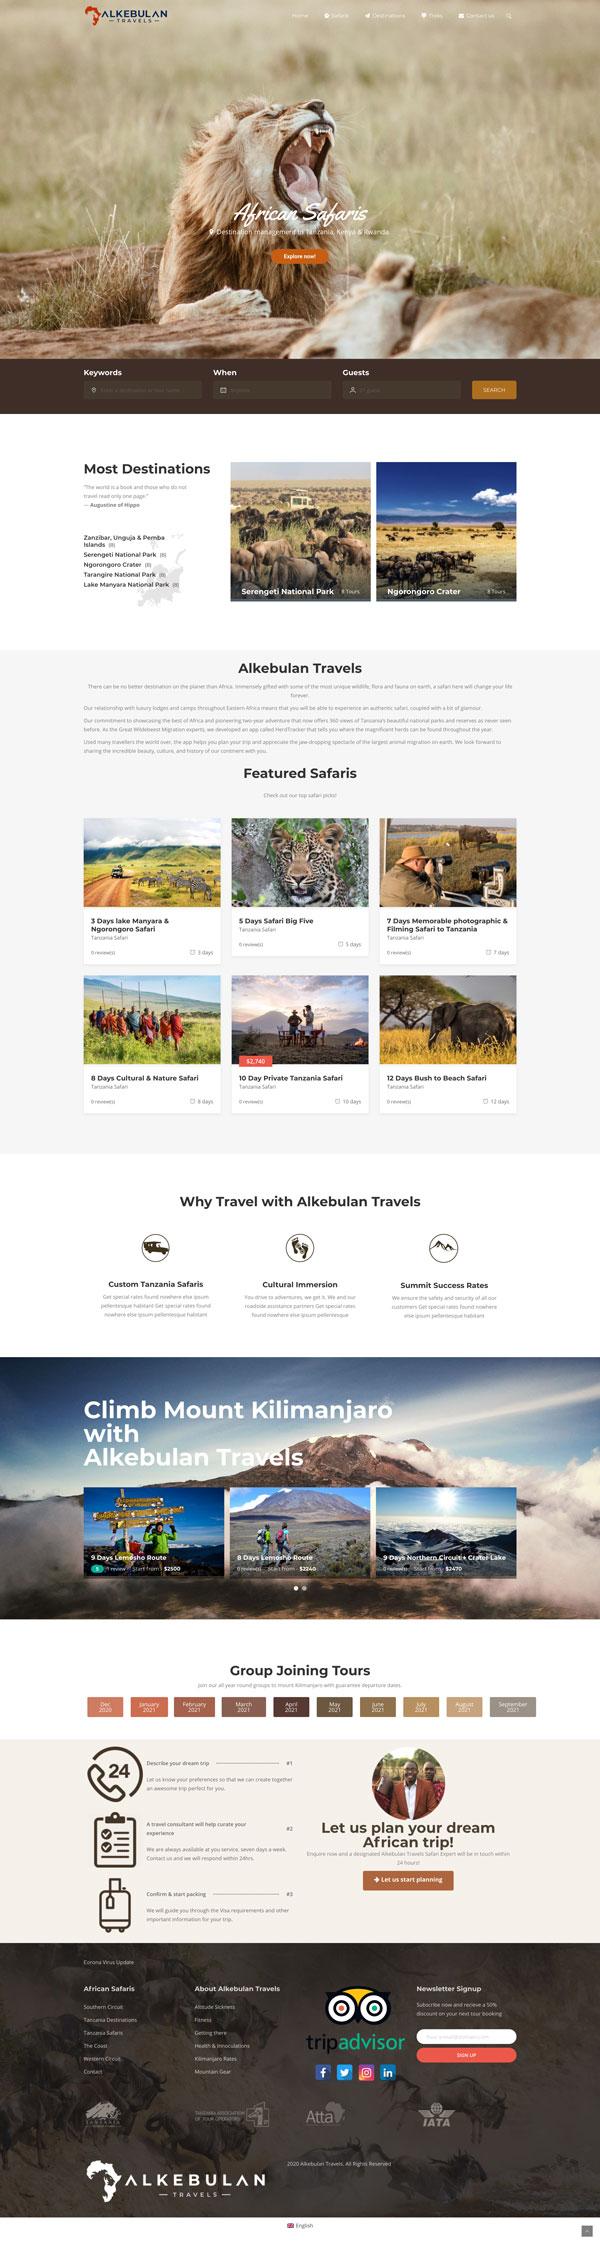 Alkebulan Travels Website